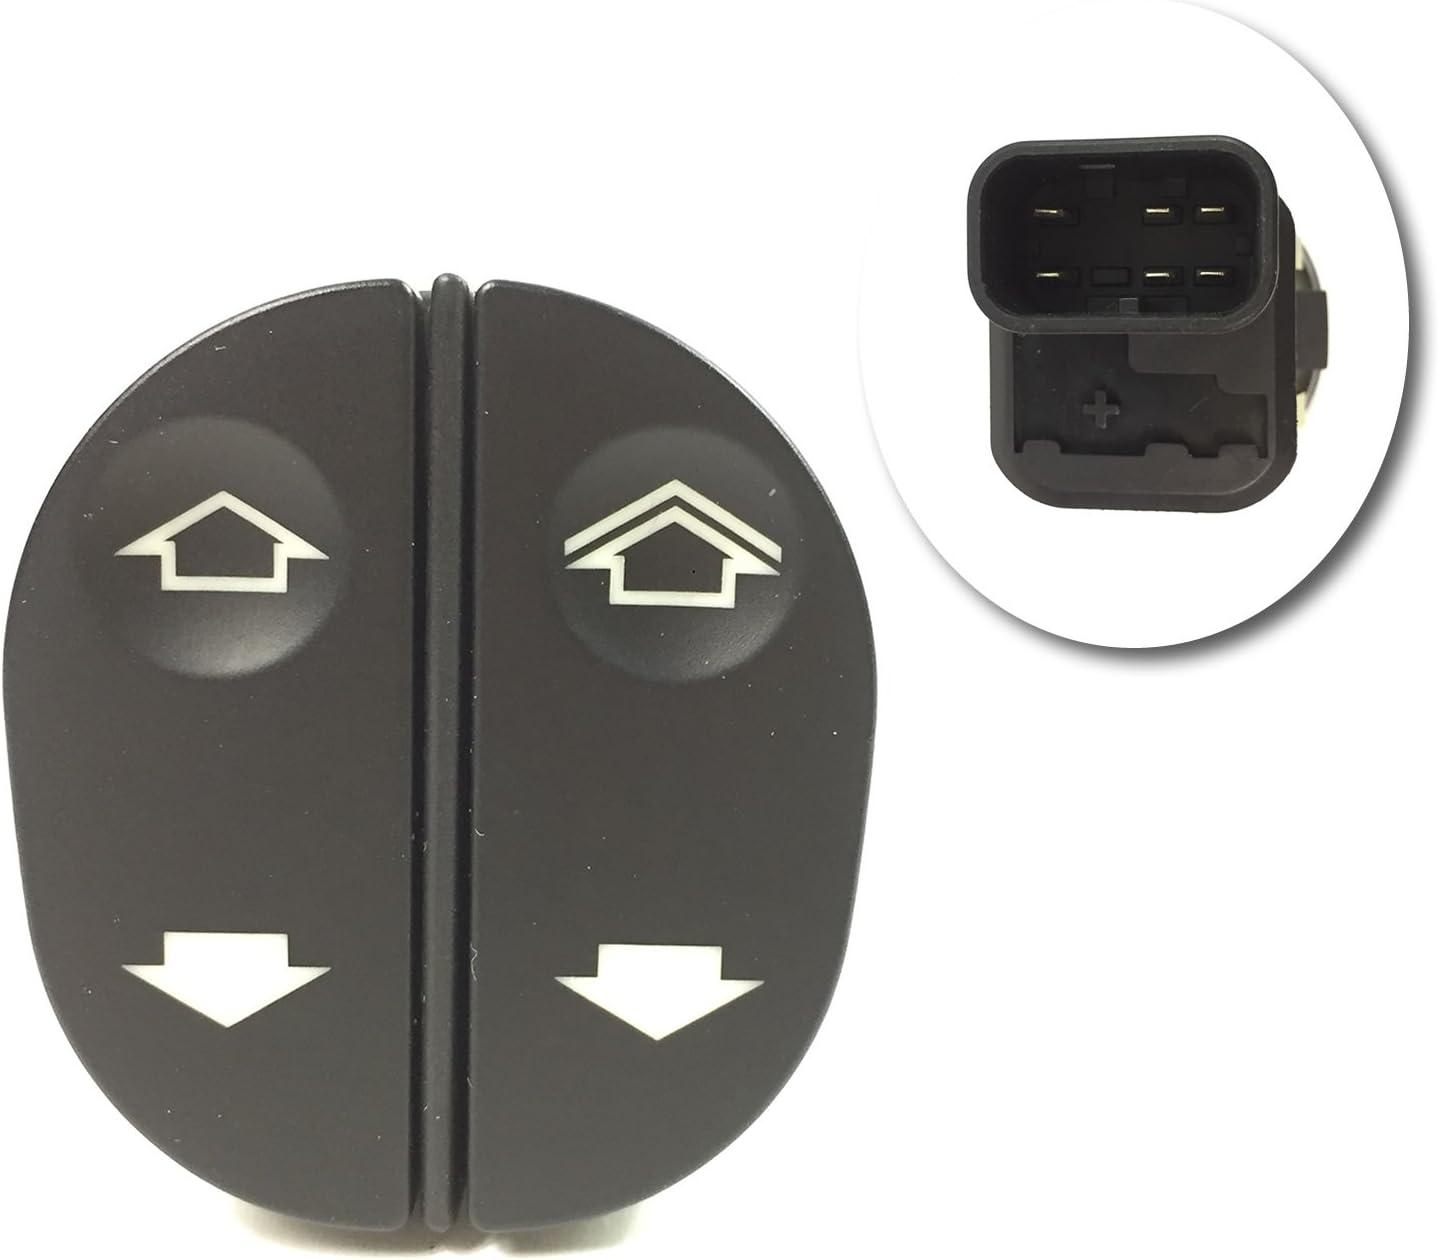 6S6T14529AB 6S6T14529AA Transit MK7 Connect Electric Power Window Control Switch Car Window Switch Window Regulator Switch